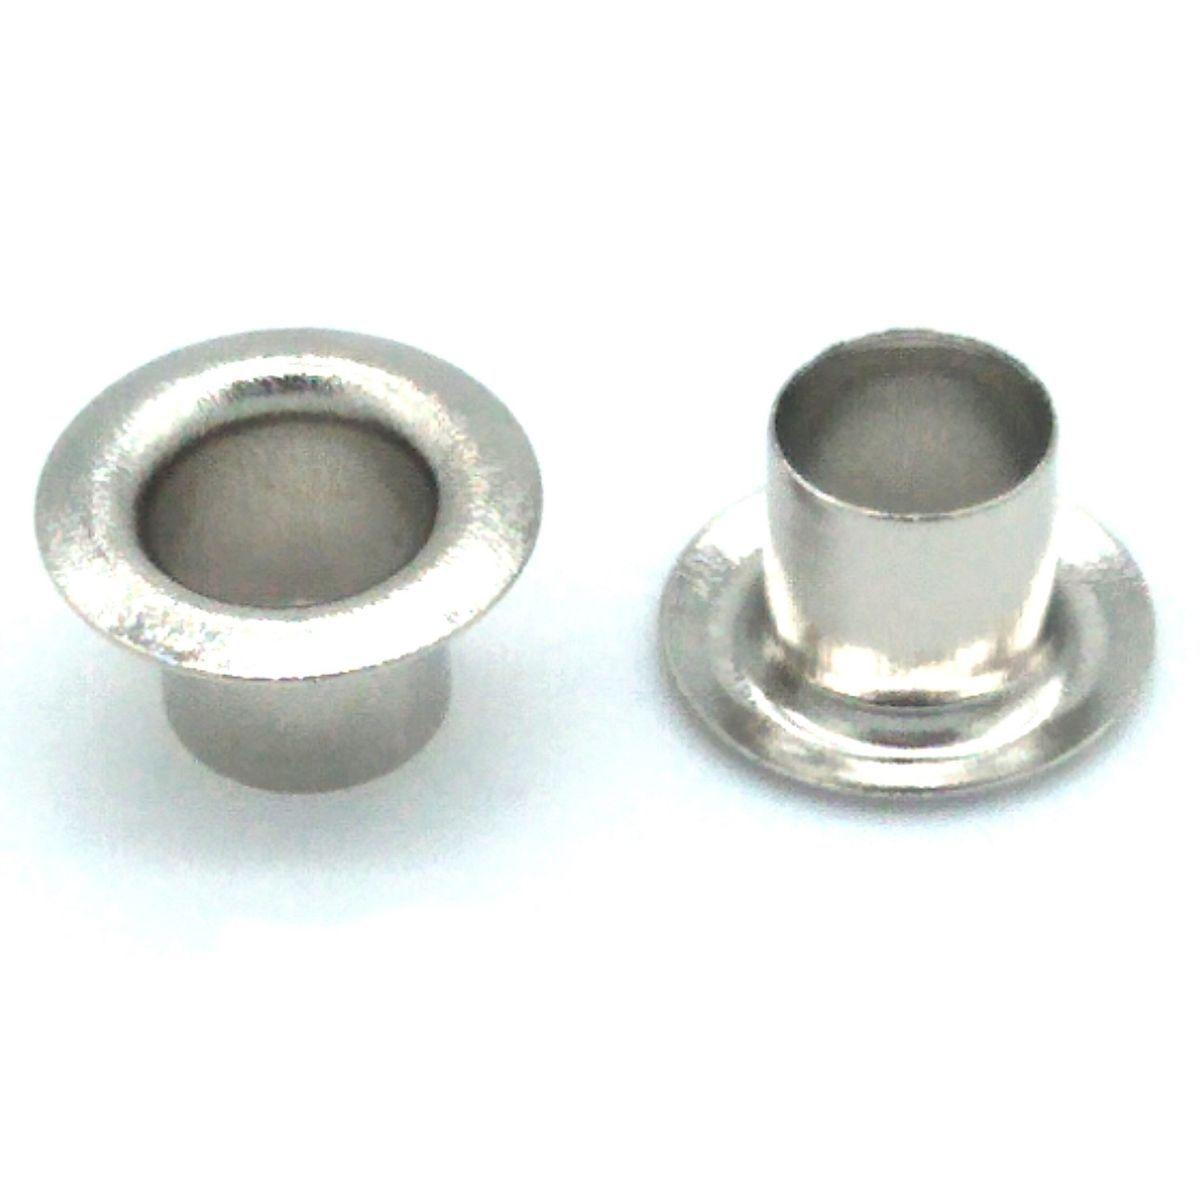 Ilhós Alumínio Prata Nº 50 11mm de diâmetro externo